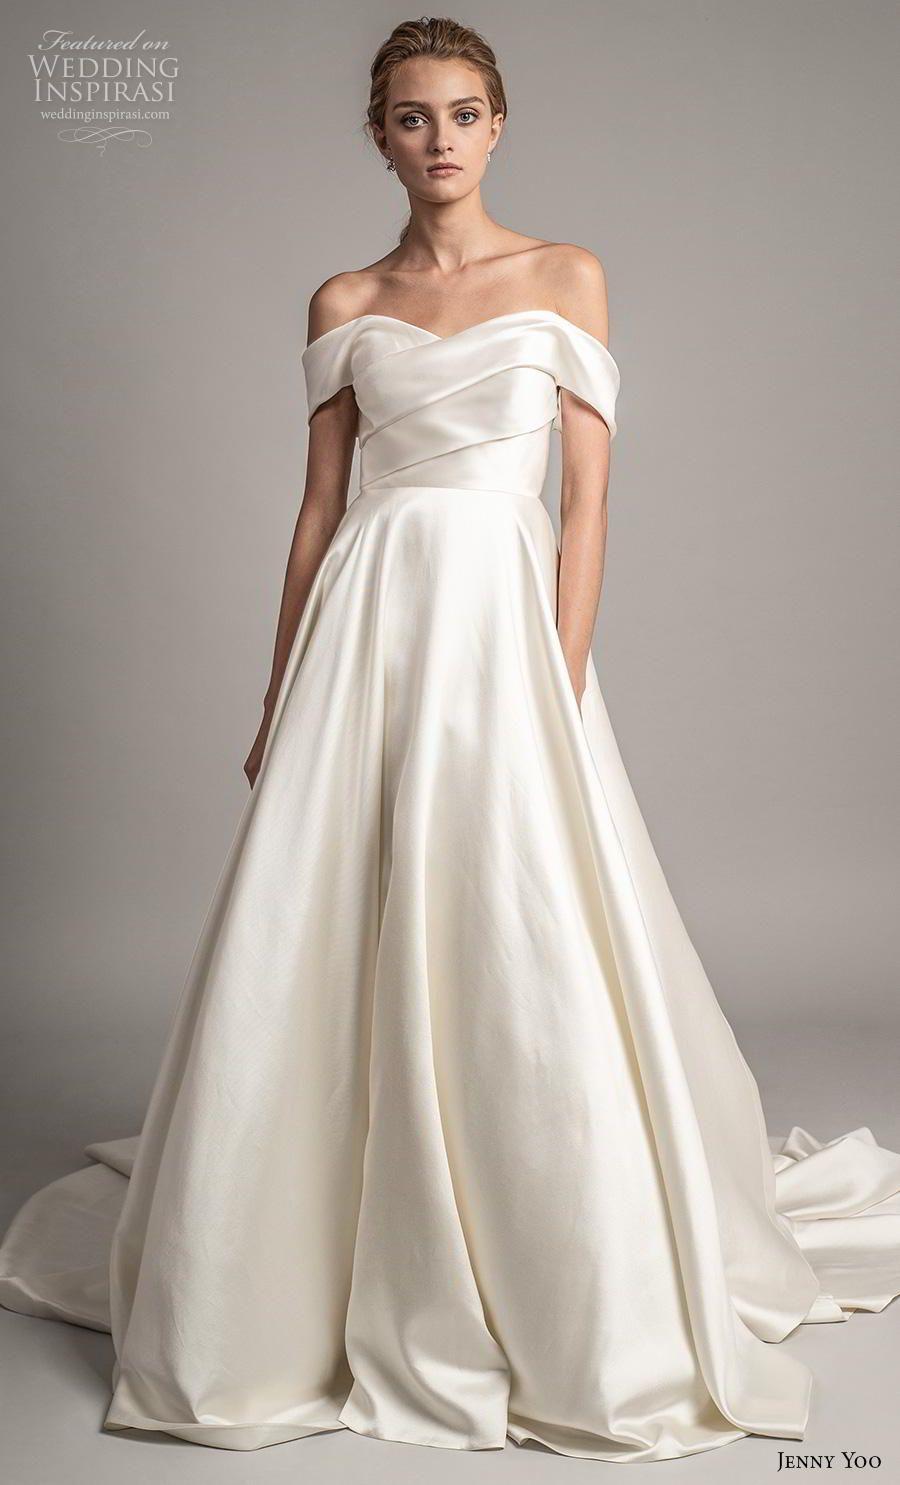 Jenny Yoo Spring 2019 Wedding Dresses Wedding Inspirasi Classic Wedding Dress Wedding Dress With Pockets Wedding Dress Silhouette Guide [ 1485 x 900 Pixel ]